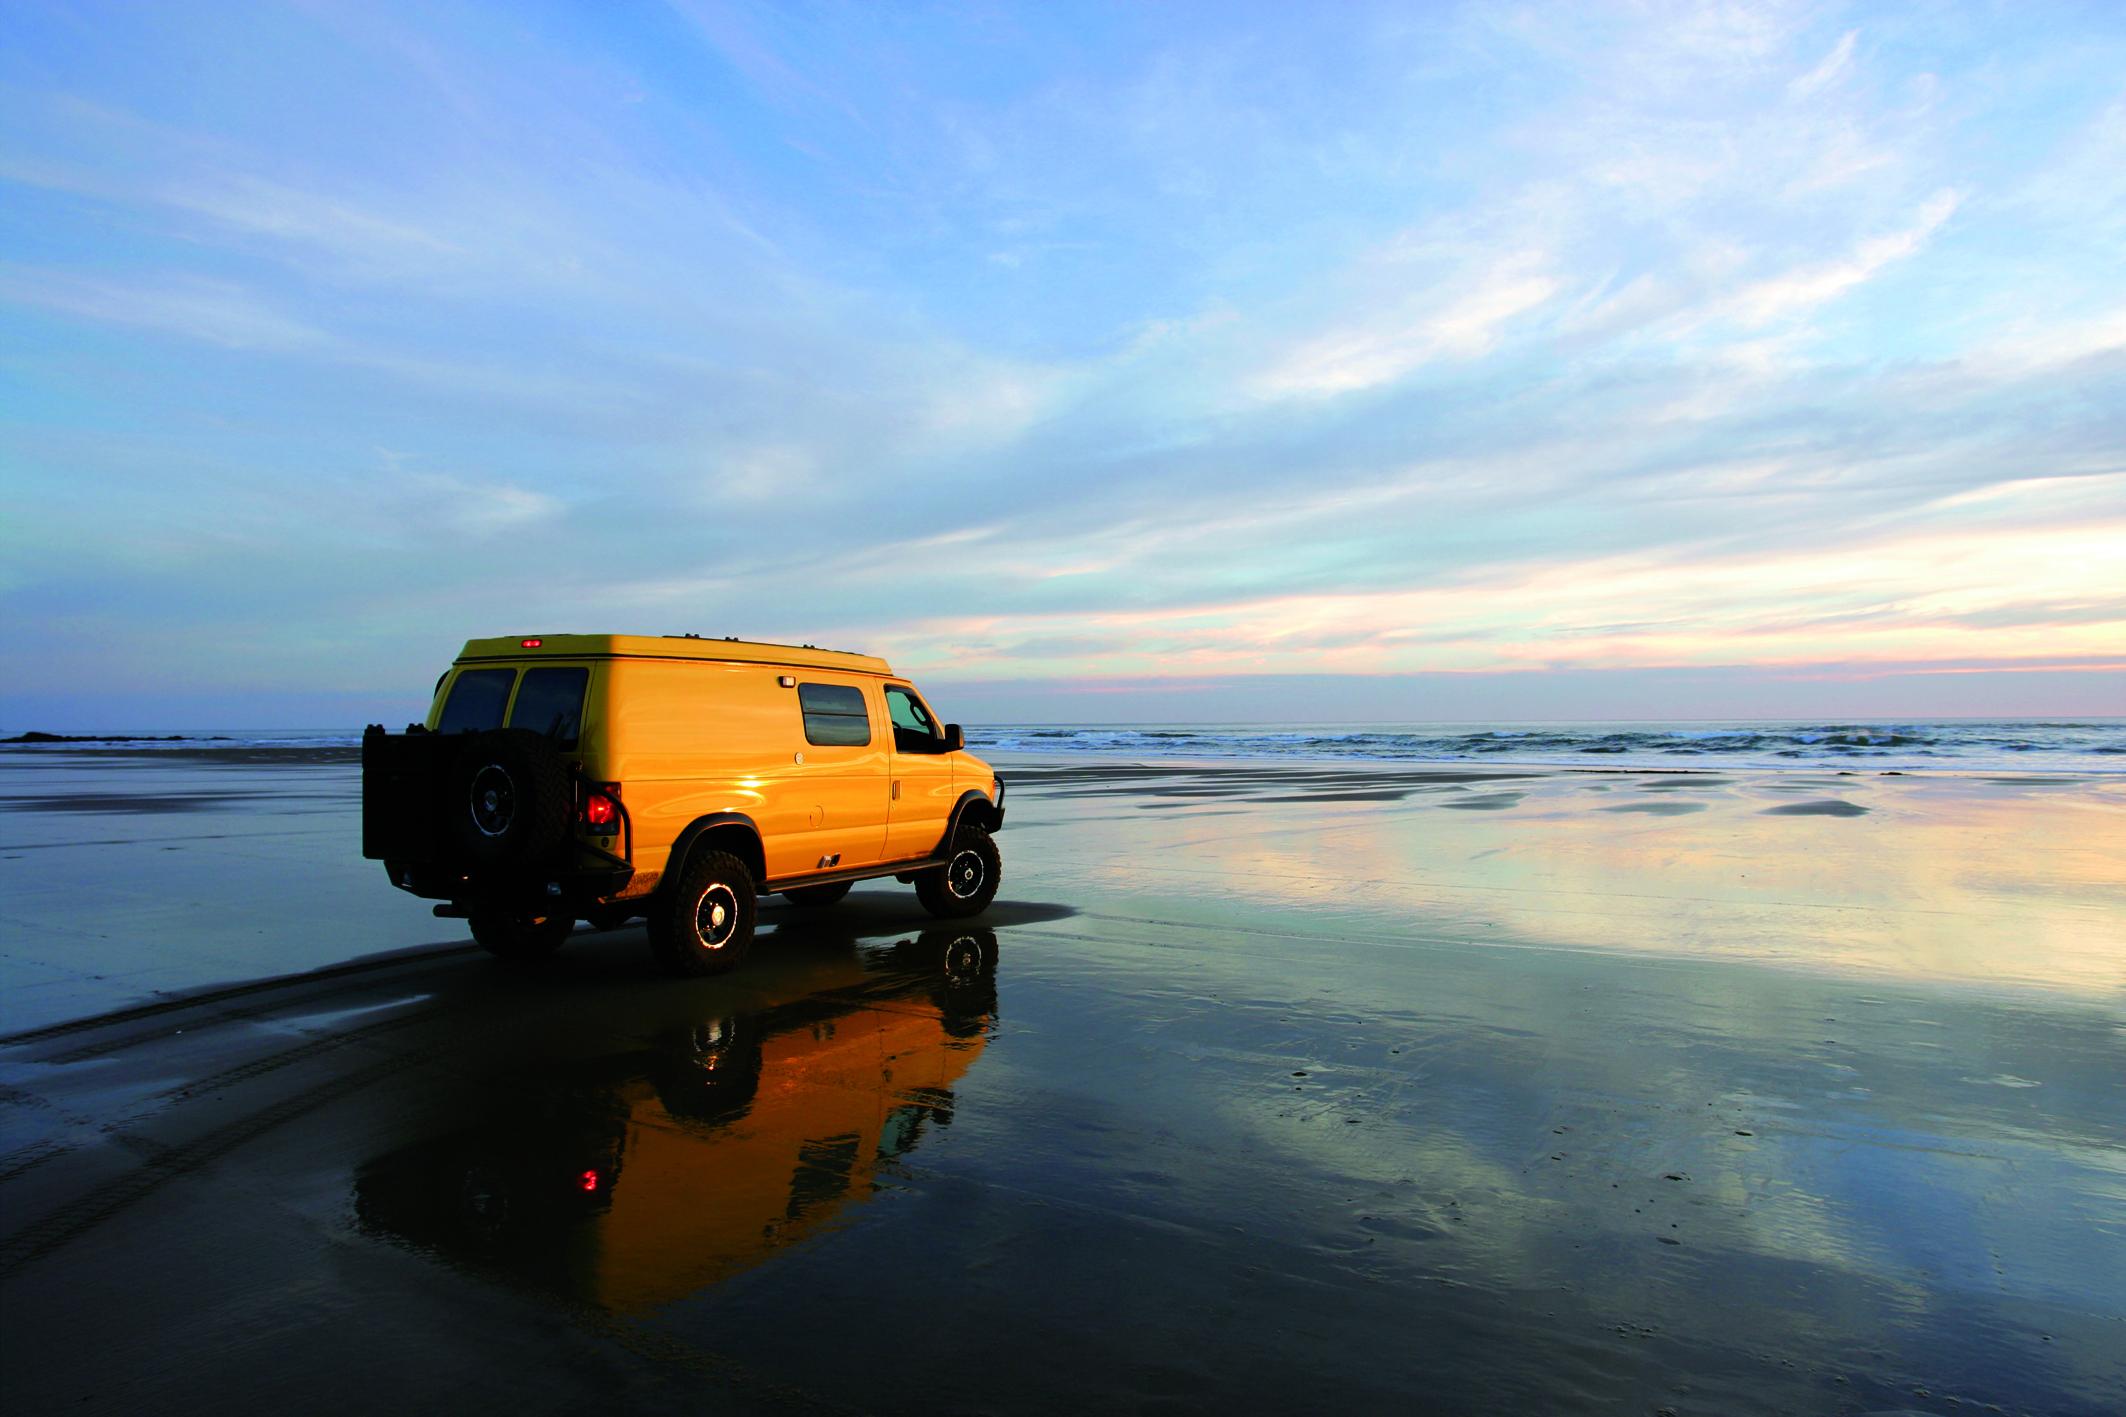 Yellow 4x4 RV van on deserted beach, Wohnmobil